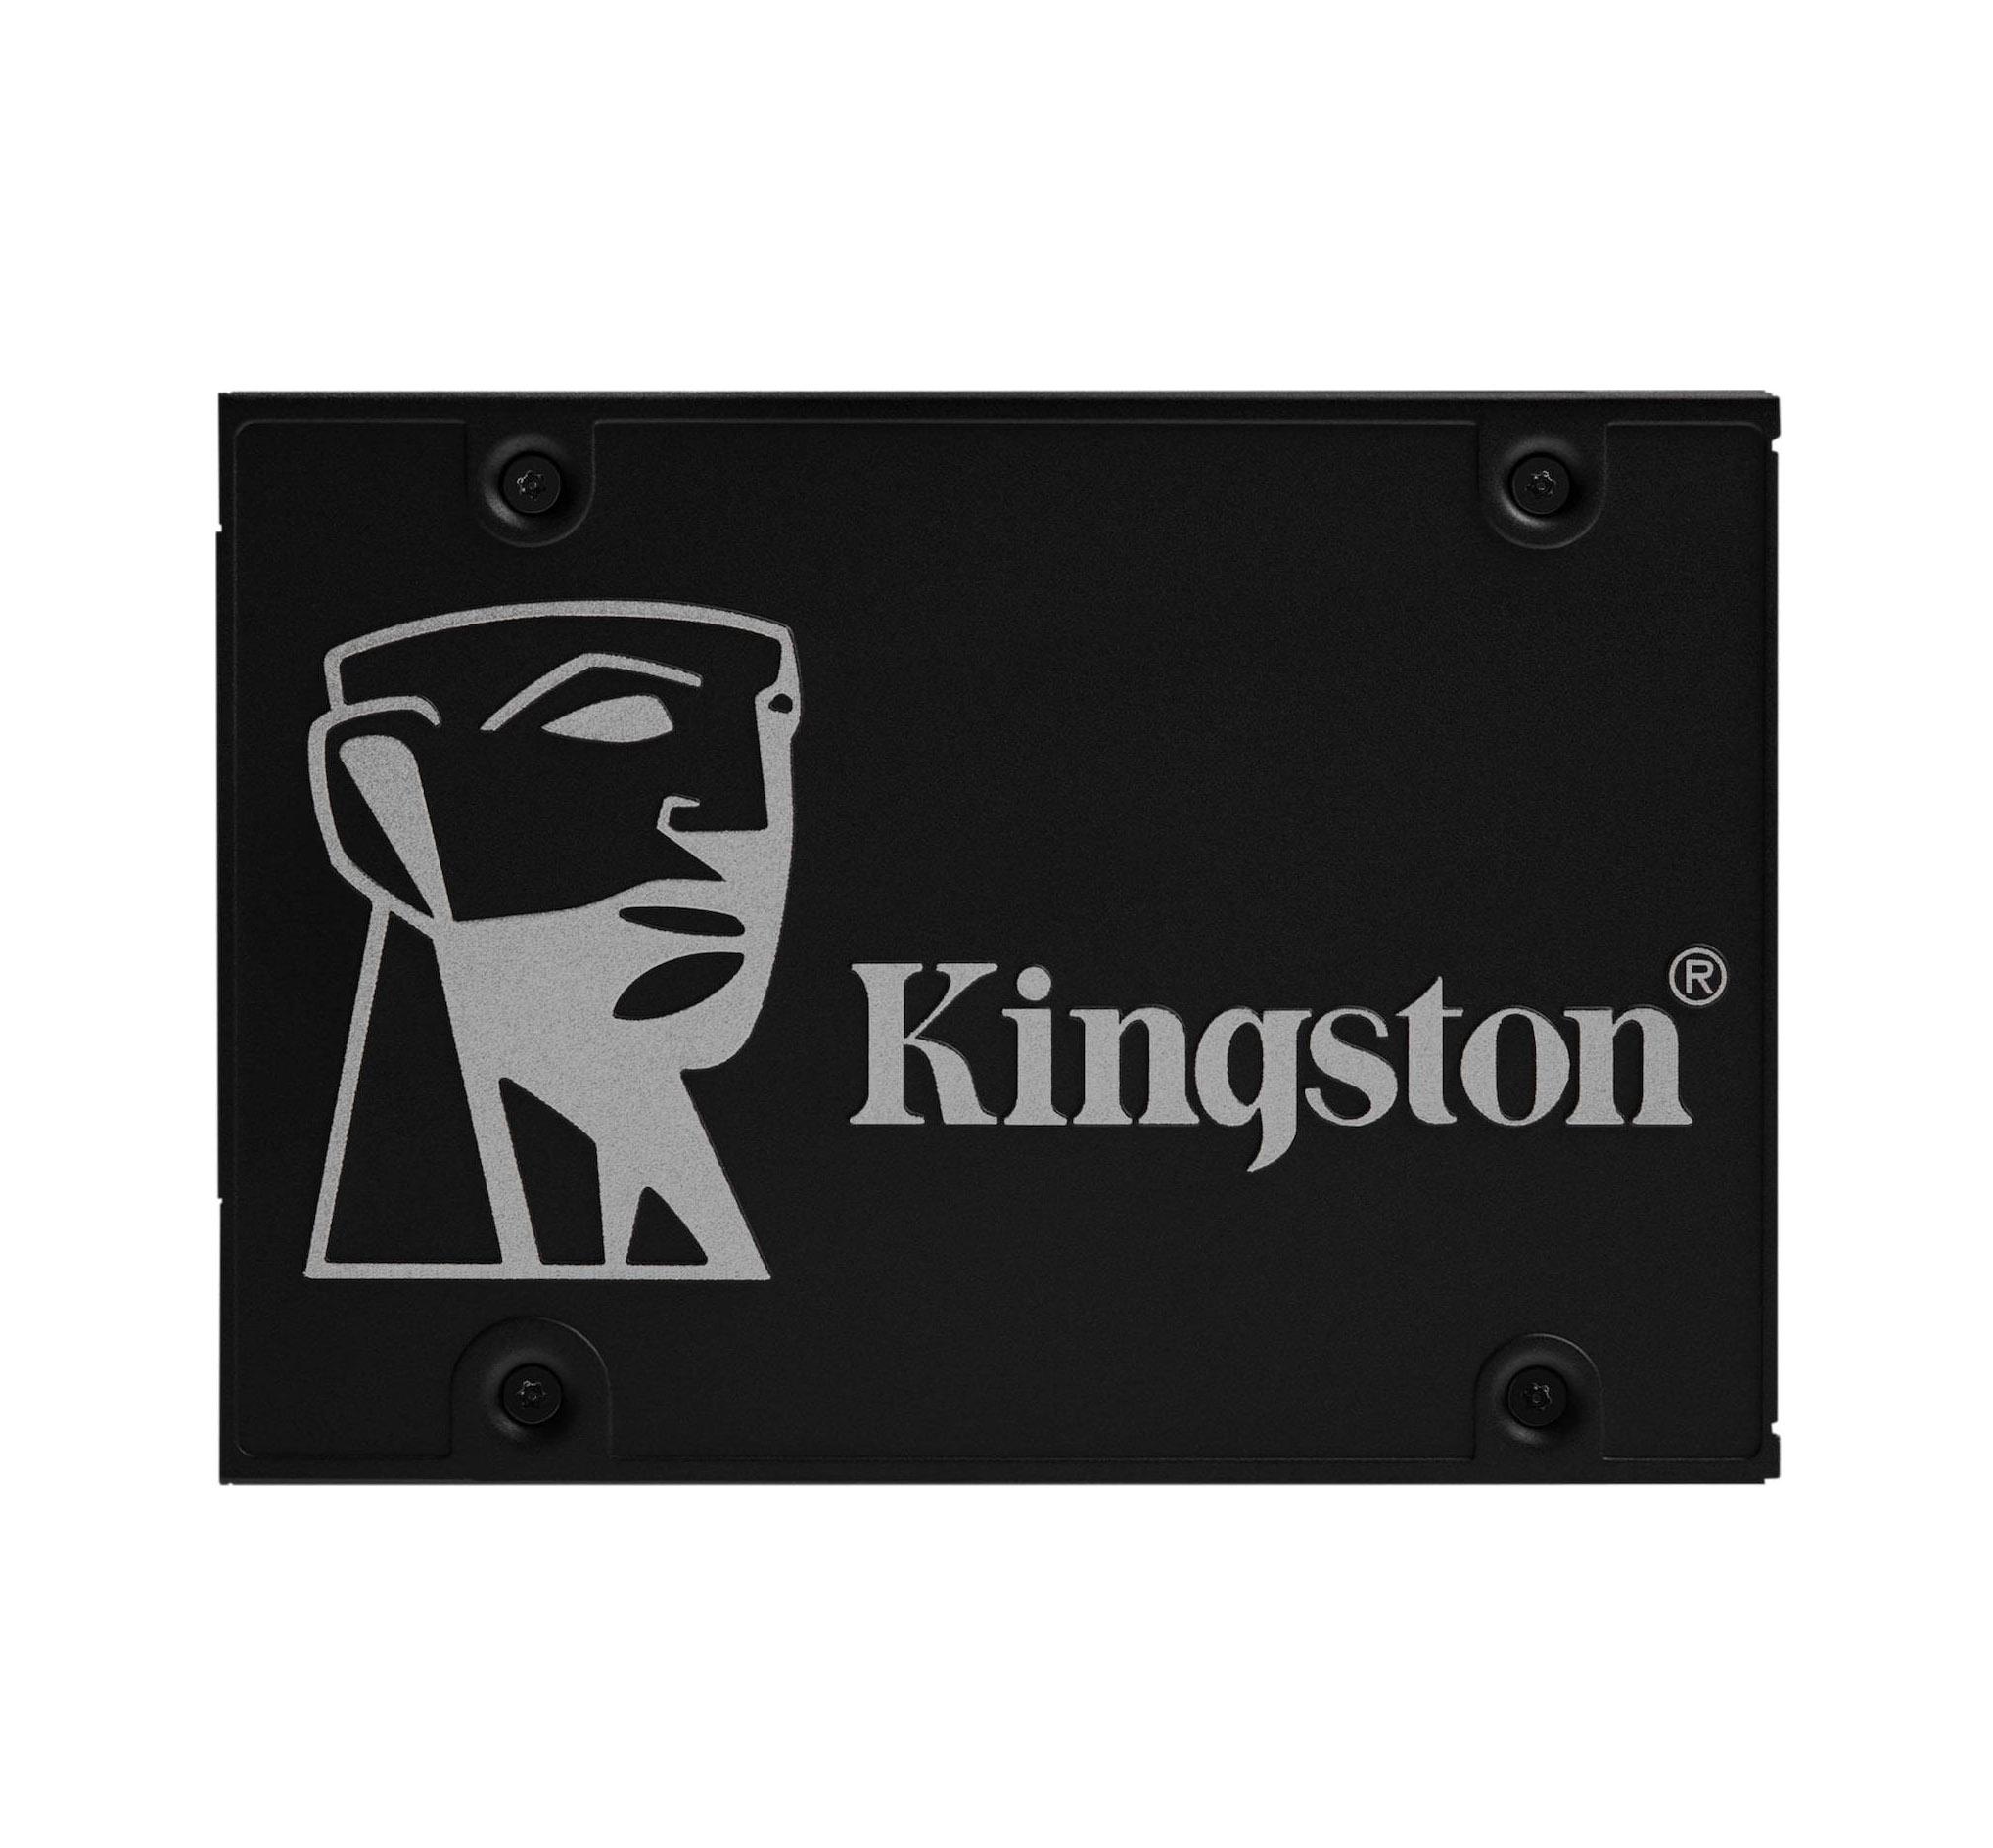 Kingston KC600 256GB SKC600/256G Σκληρός Δίσκος SSD